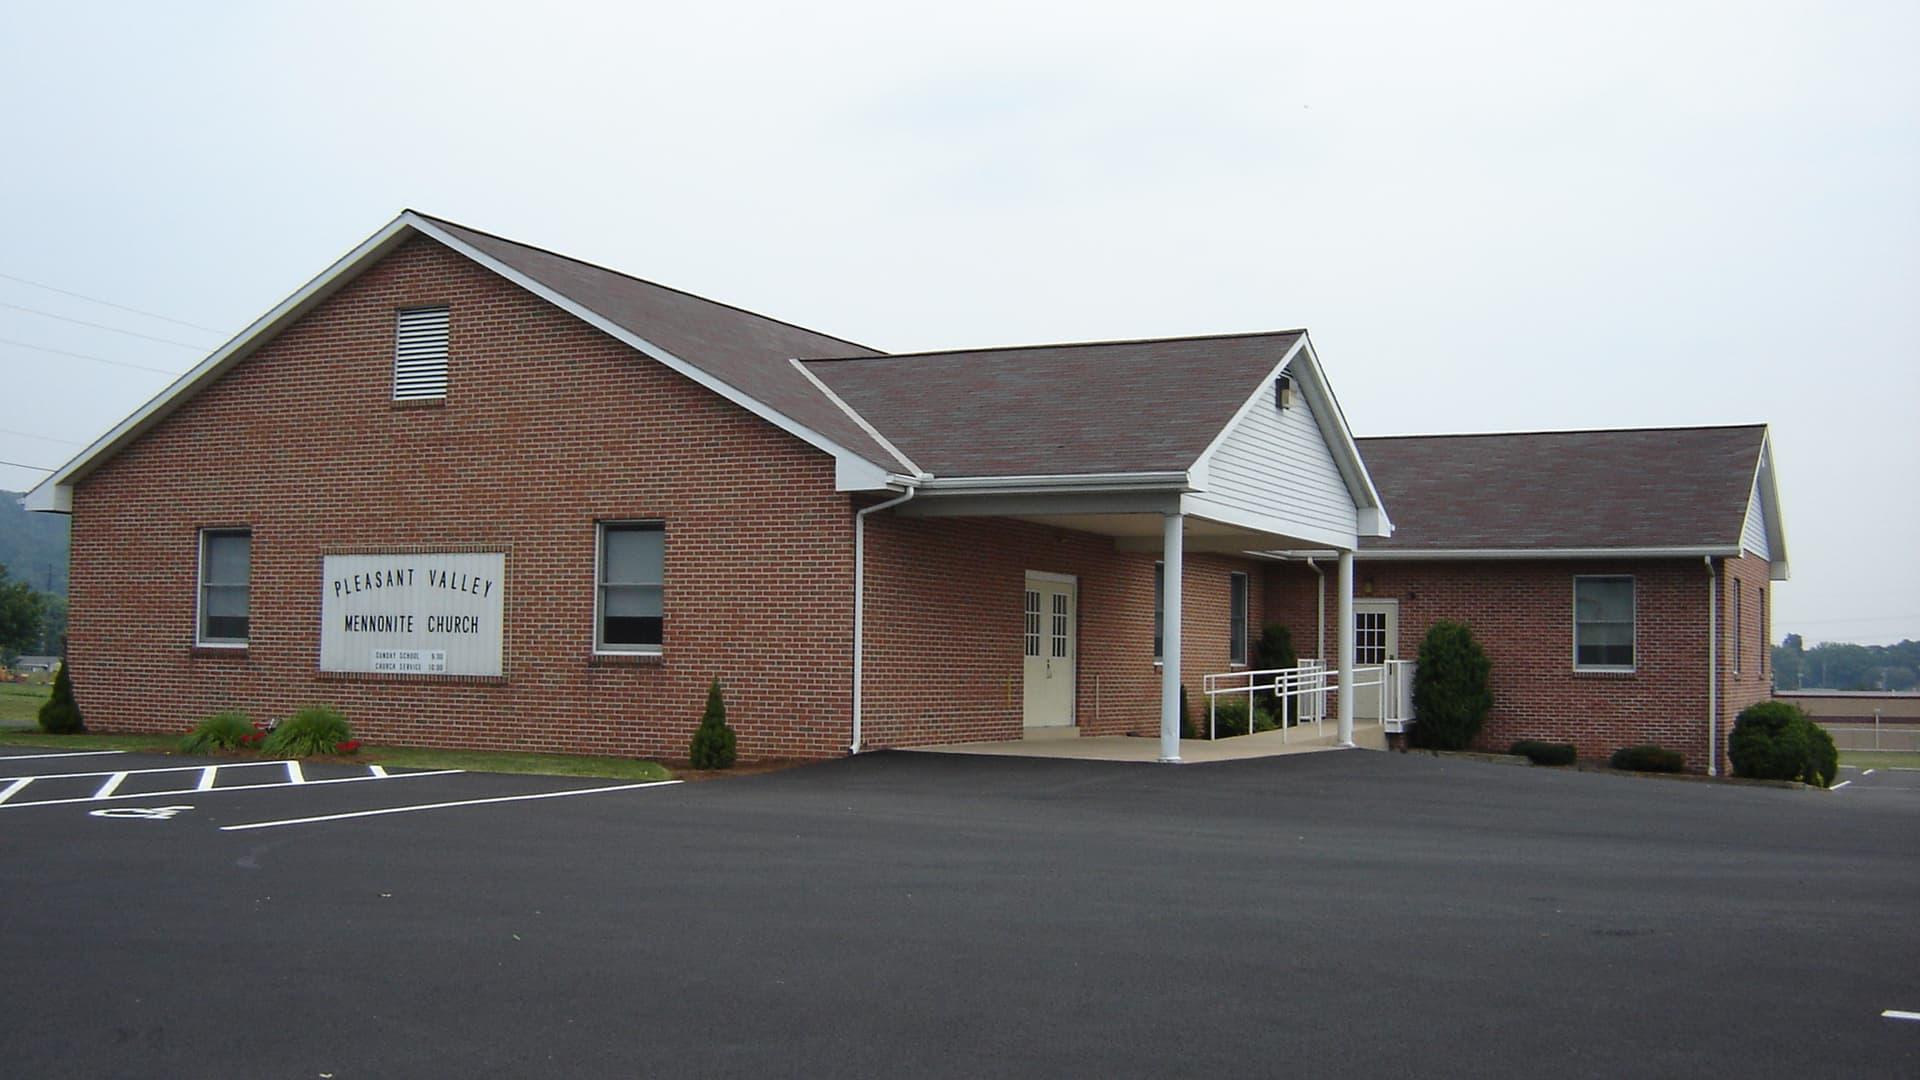 Pleasant Valley Mennonite Church